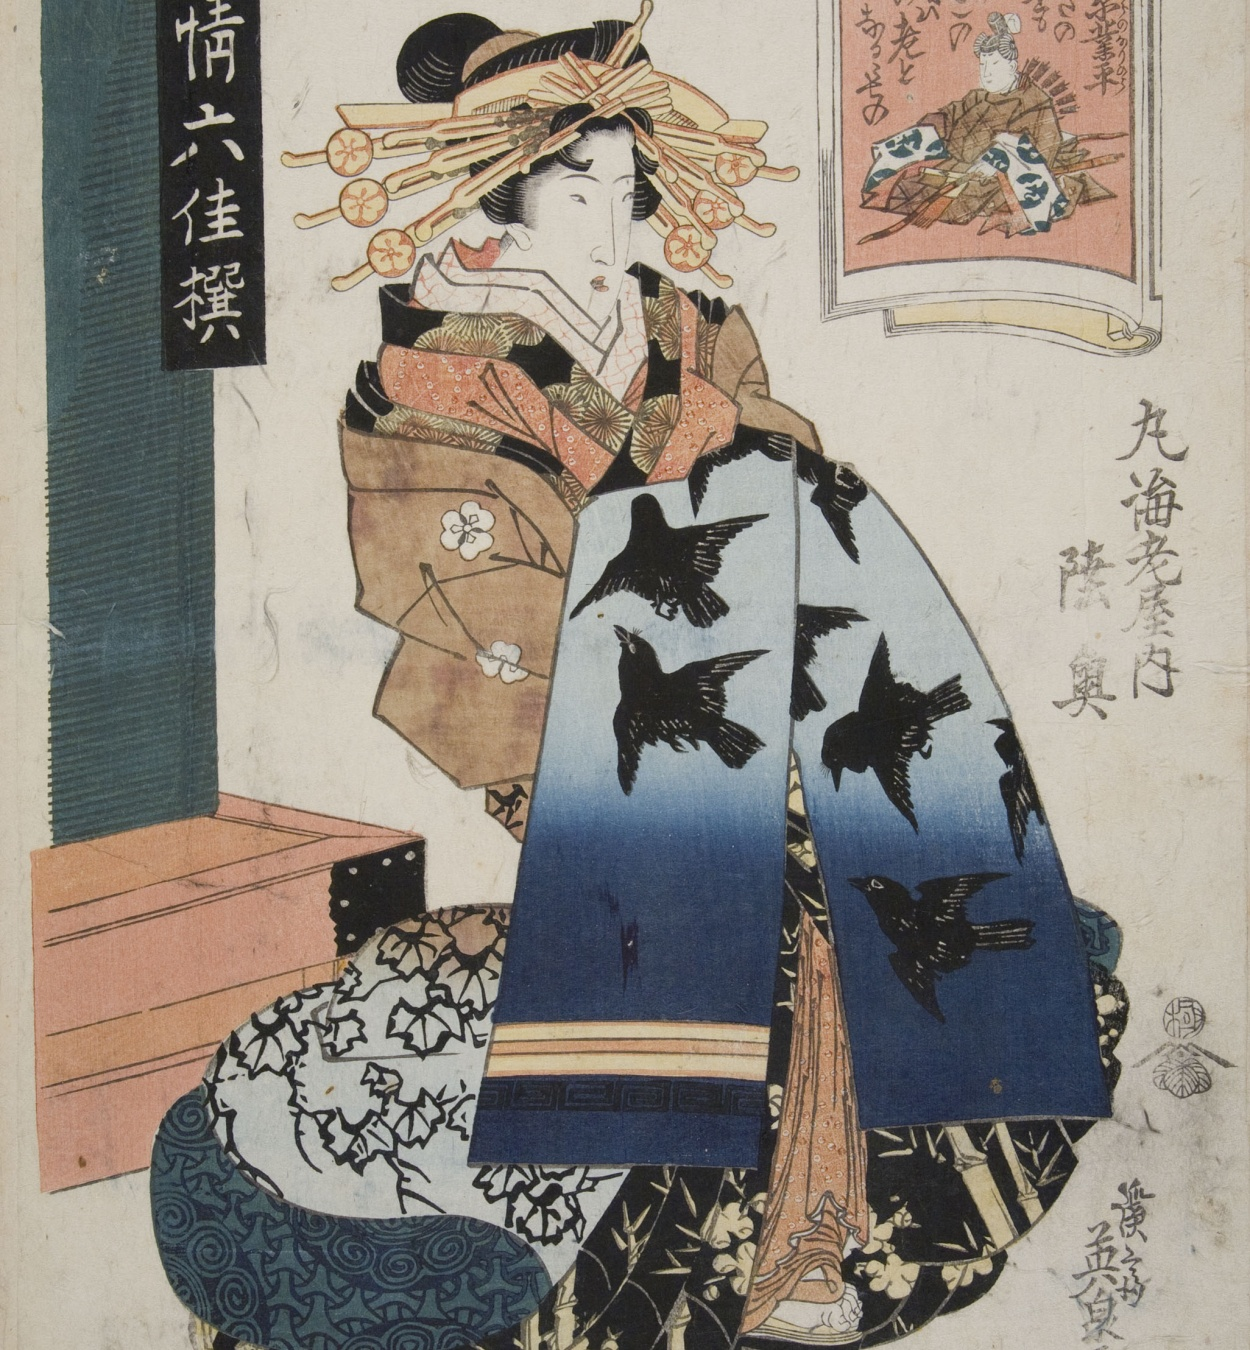 Utagawa Kunisada (Toyokuni III) - Ukiyo-e (album with seventy pictures) - End of the 18th century – mid-19th century [2]